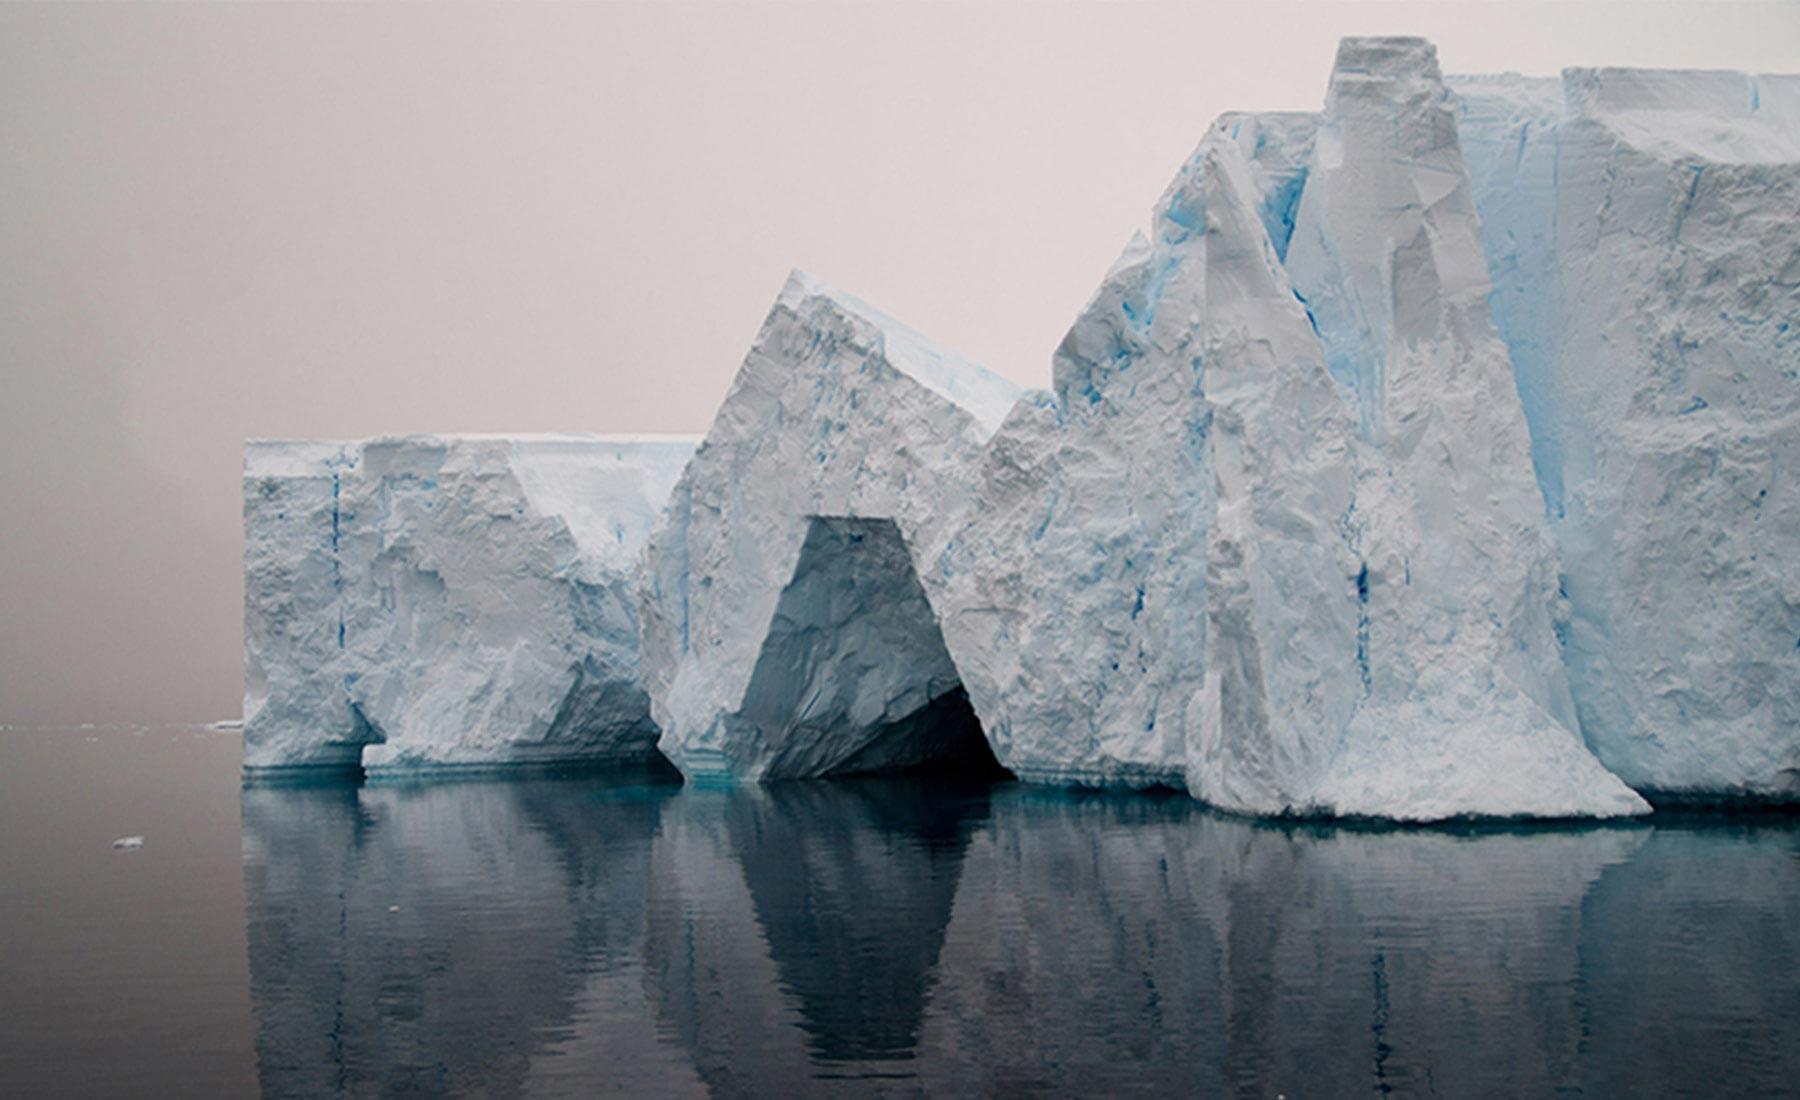 hugo-livet-geometrical-icebergs-05